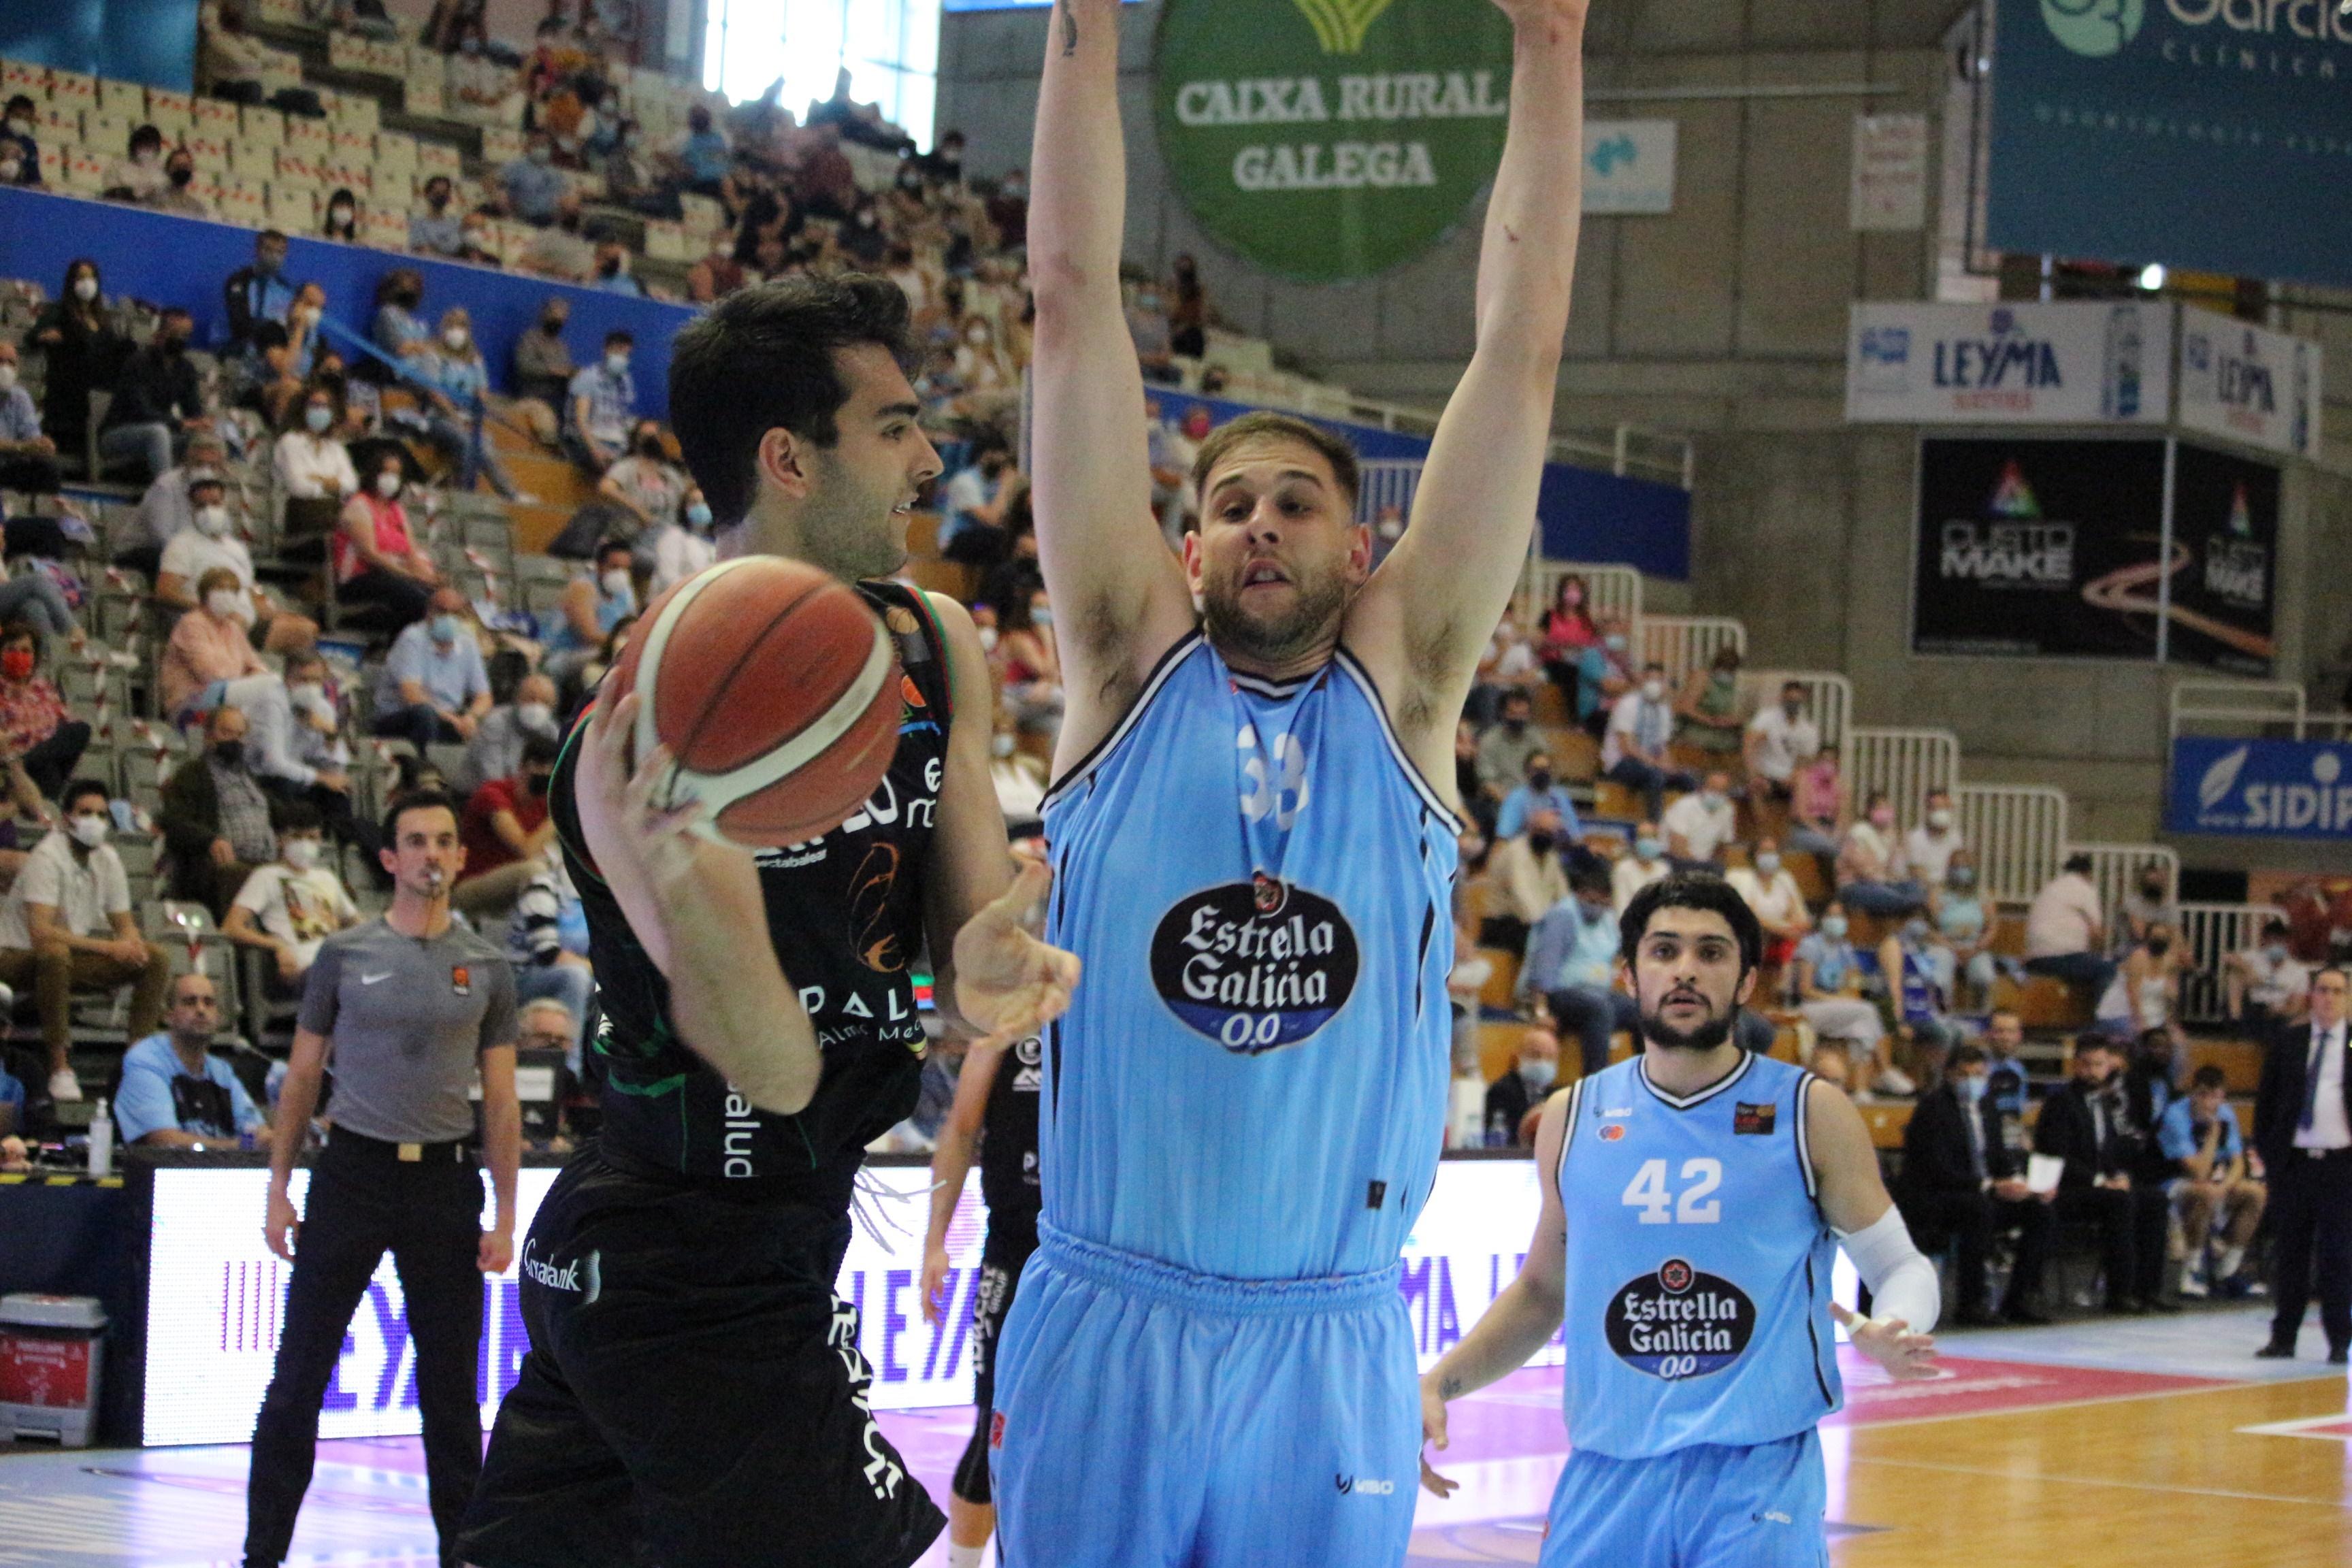 Jacobo Díaz cae eliminado en cuartos de LEB Oro y pone fin a su cesión en Mallorca